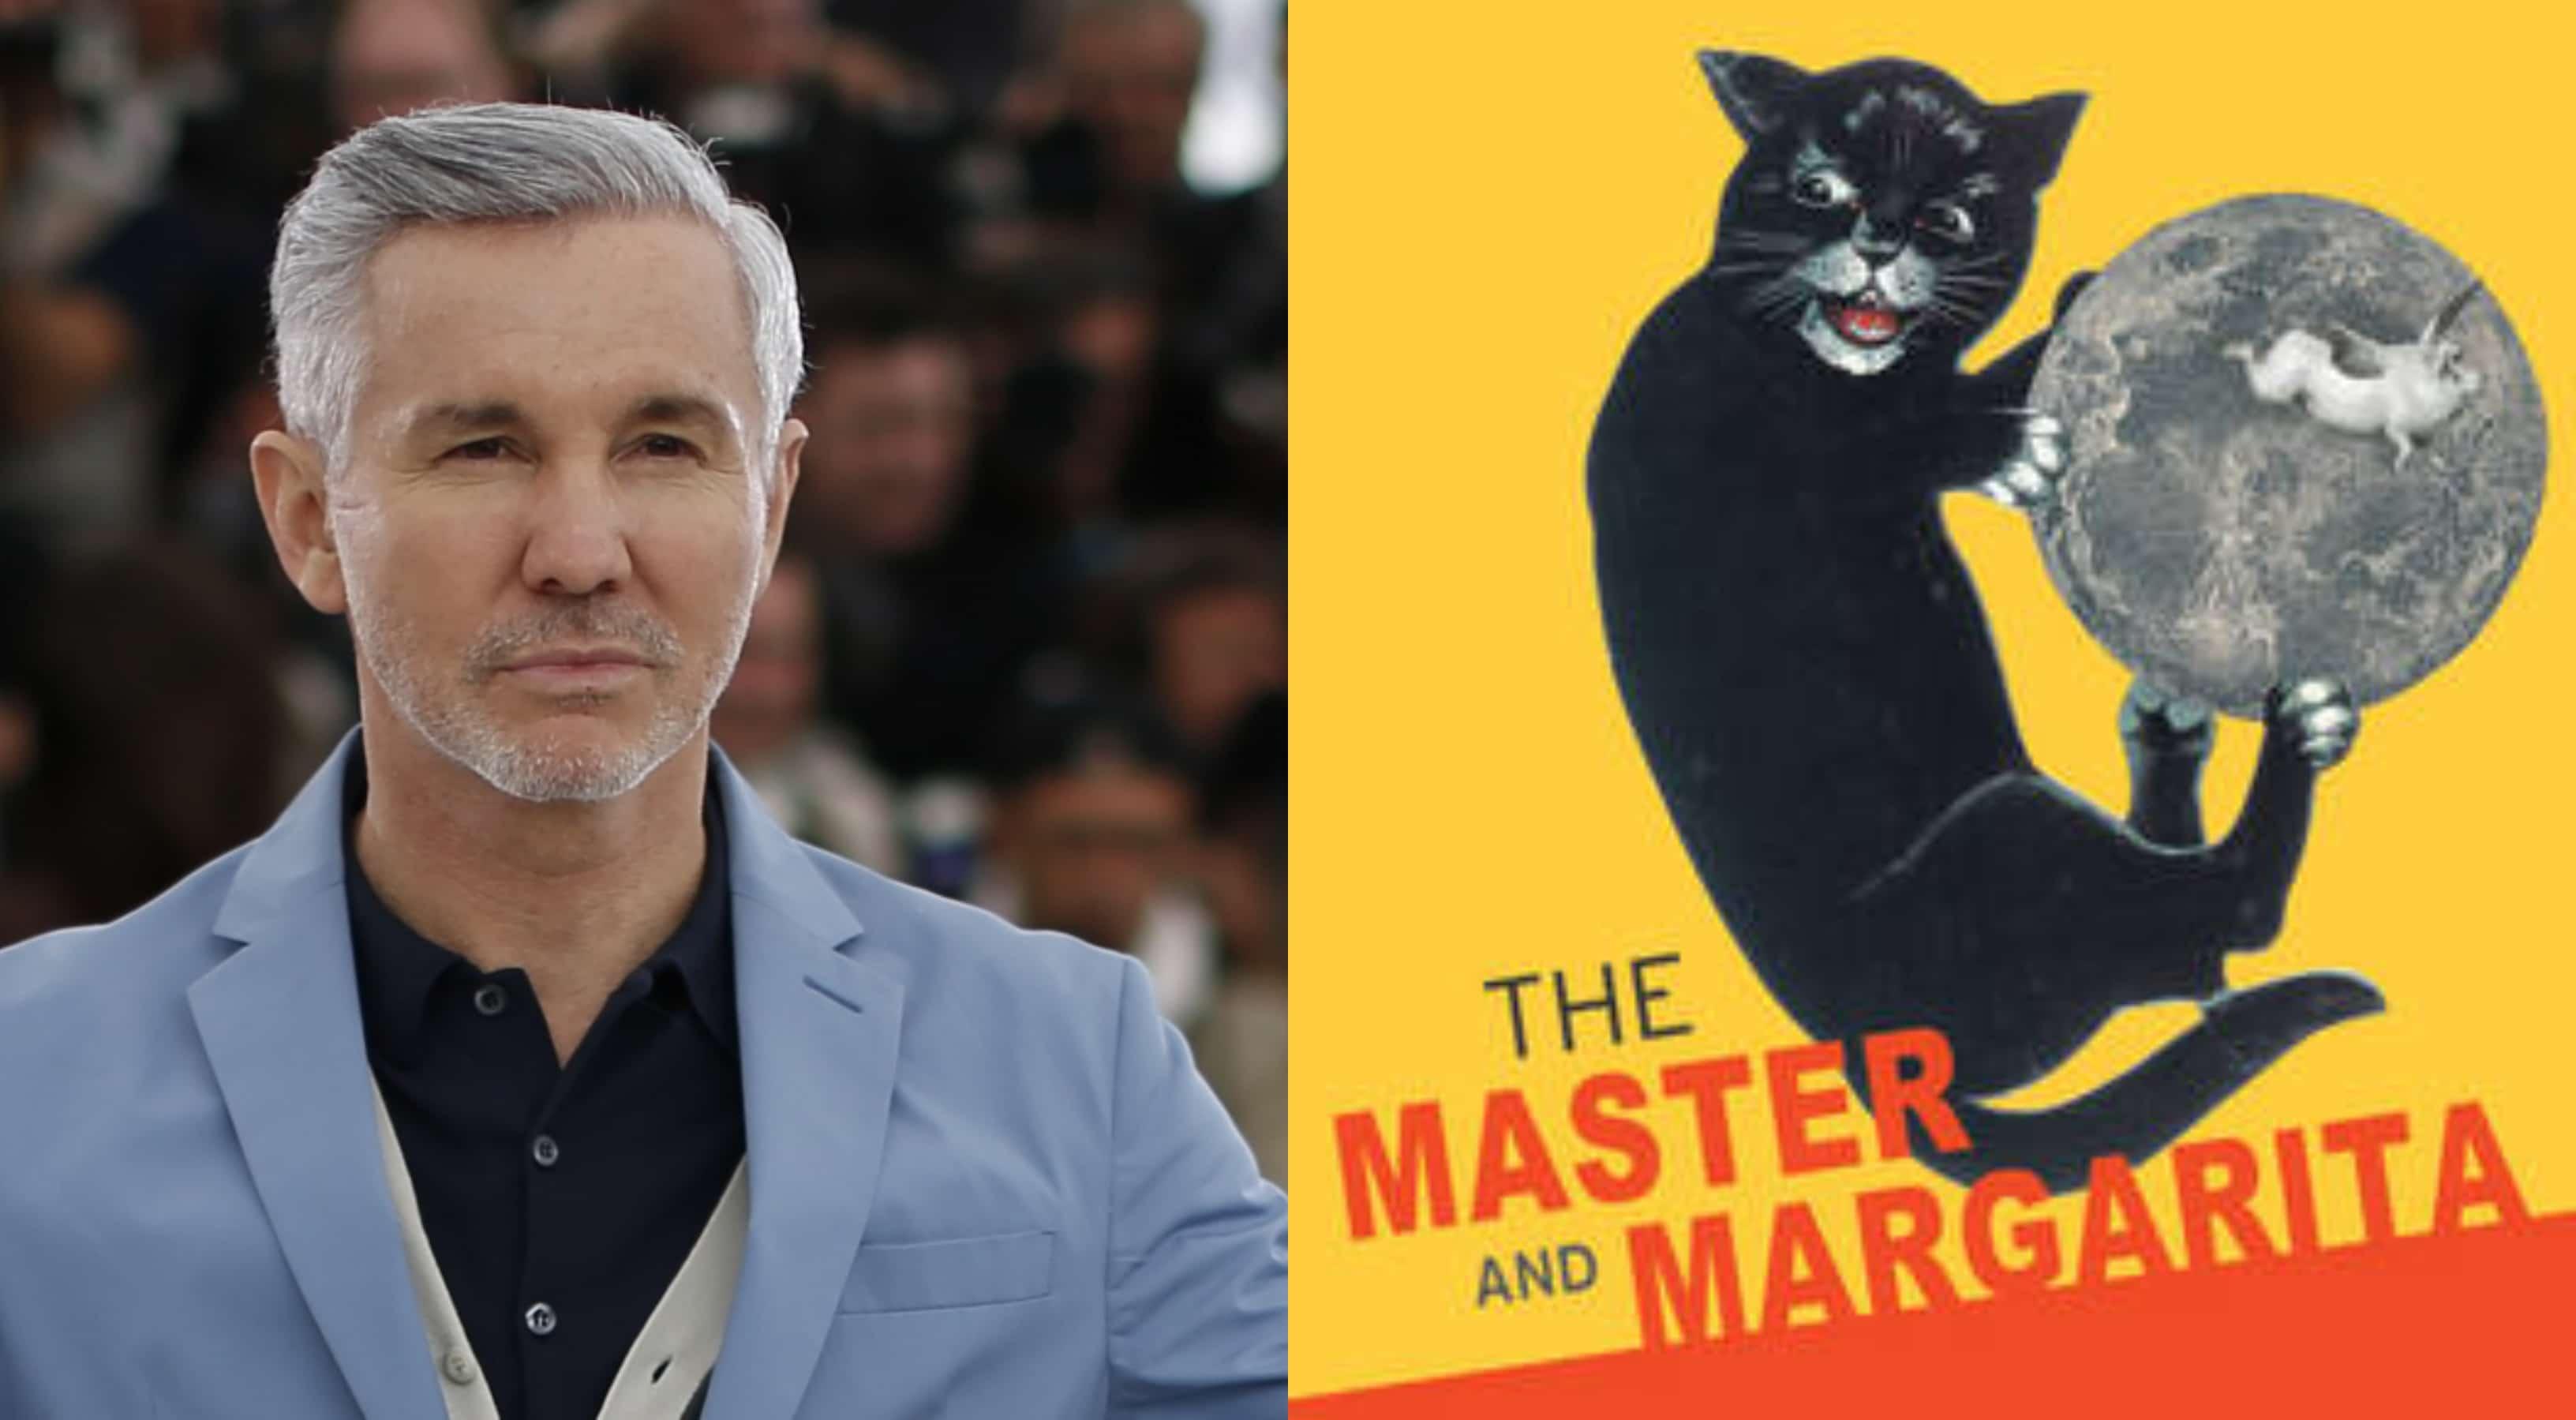 Film News: Baz Luhrmann set to adapt 'The Master and Margarita'